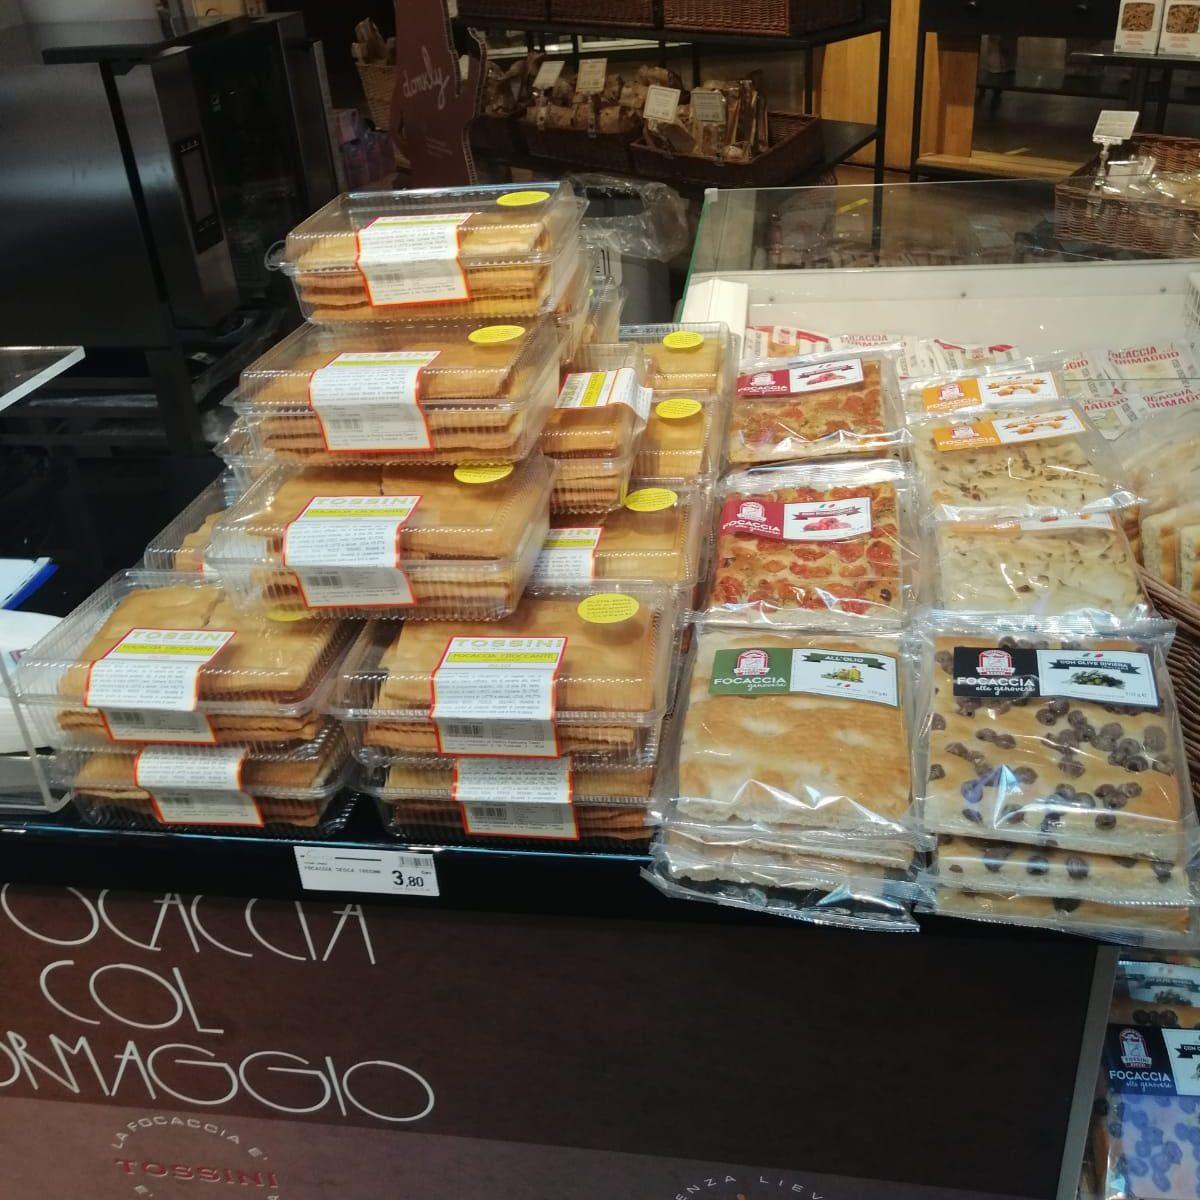 Corner Tossini -Eataly Store Milano Smeraldo (14)